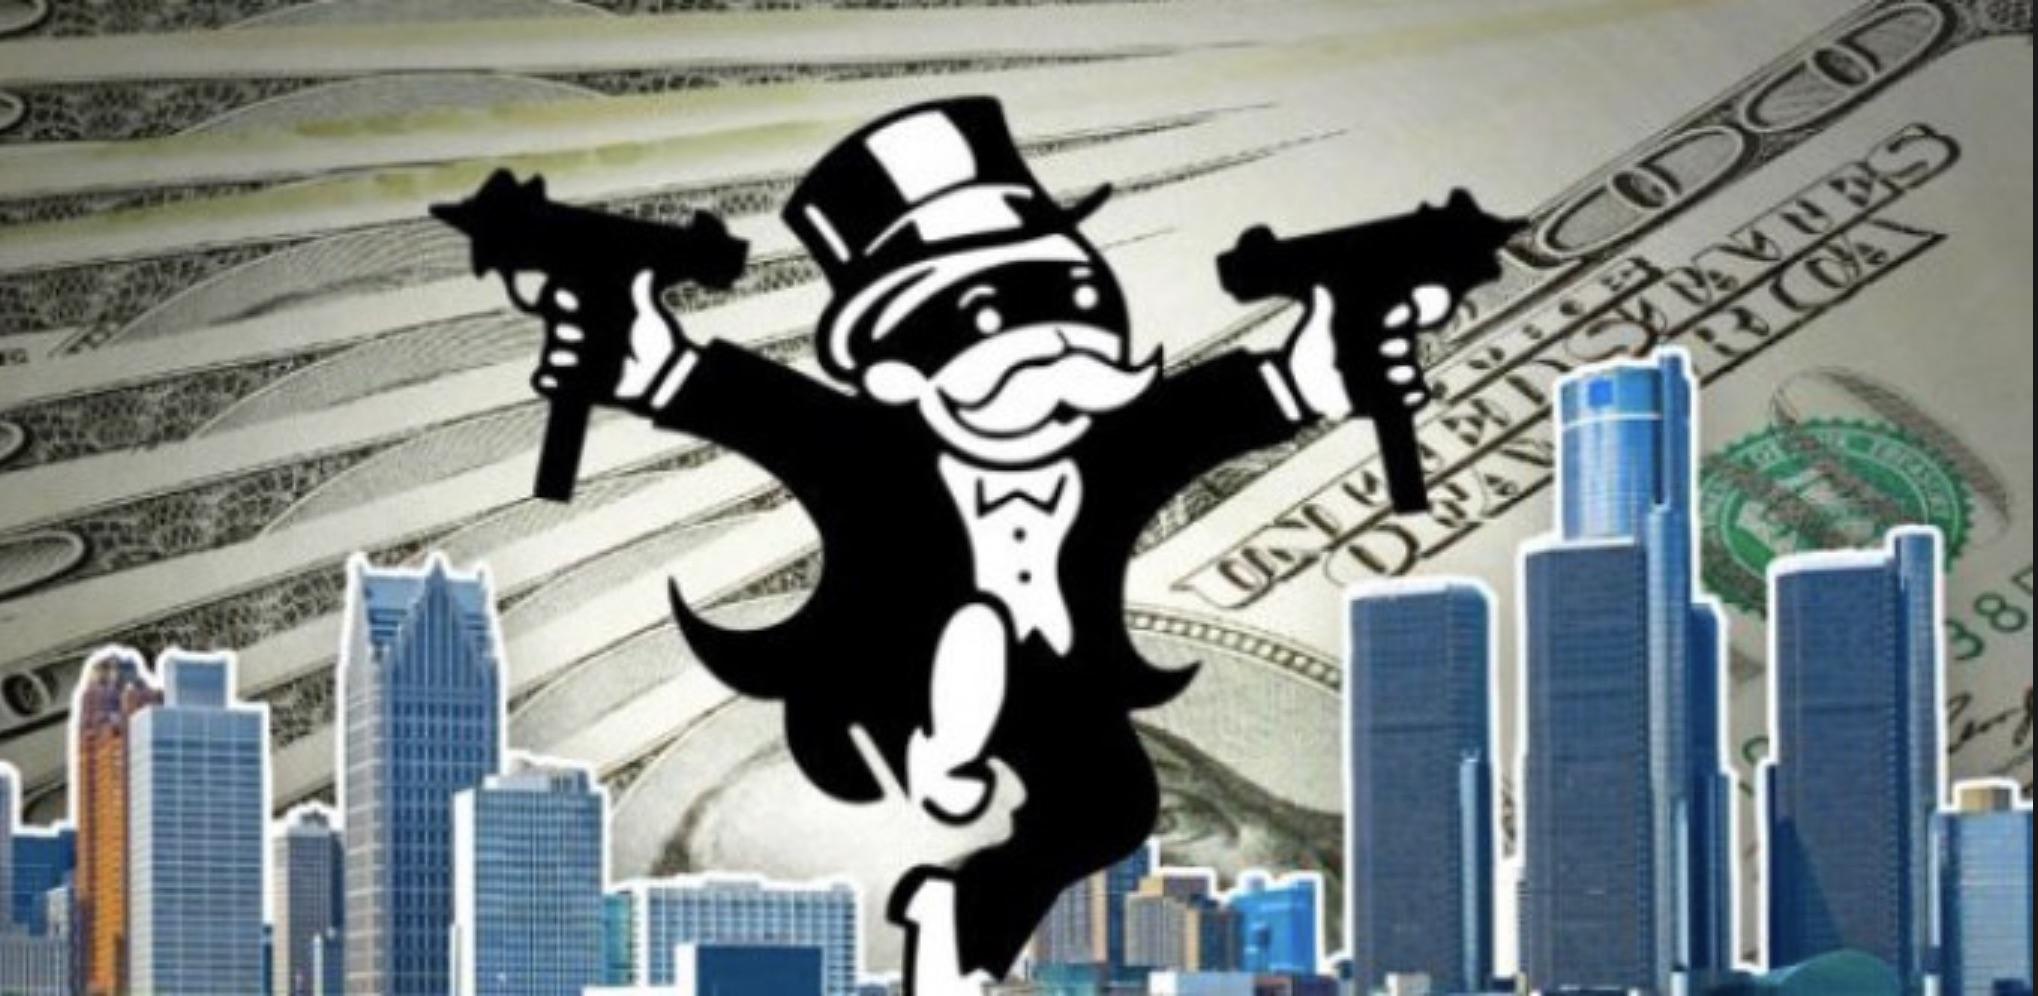 king-world-news-preparing-for-financial-armageddon